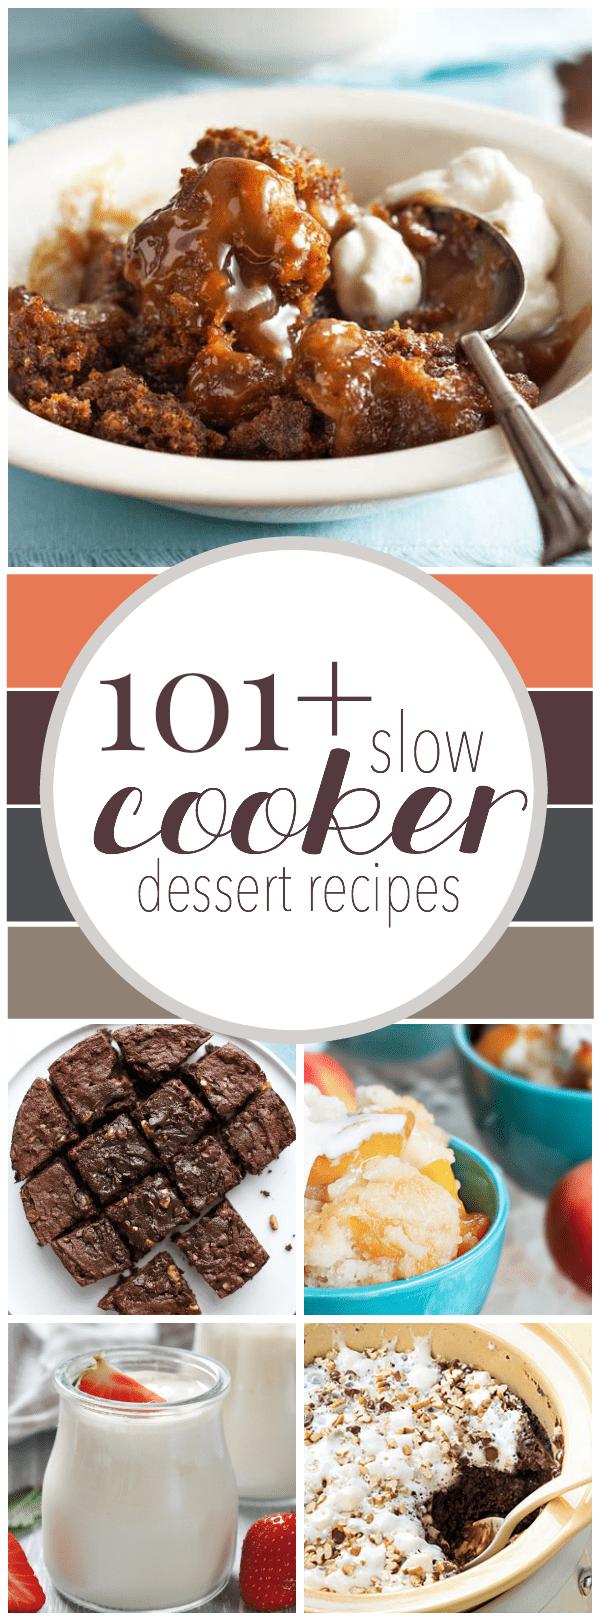 Over 100 Slow Cooker Dessert Recipes!